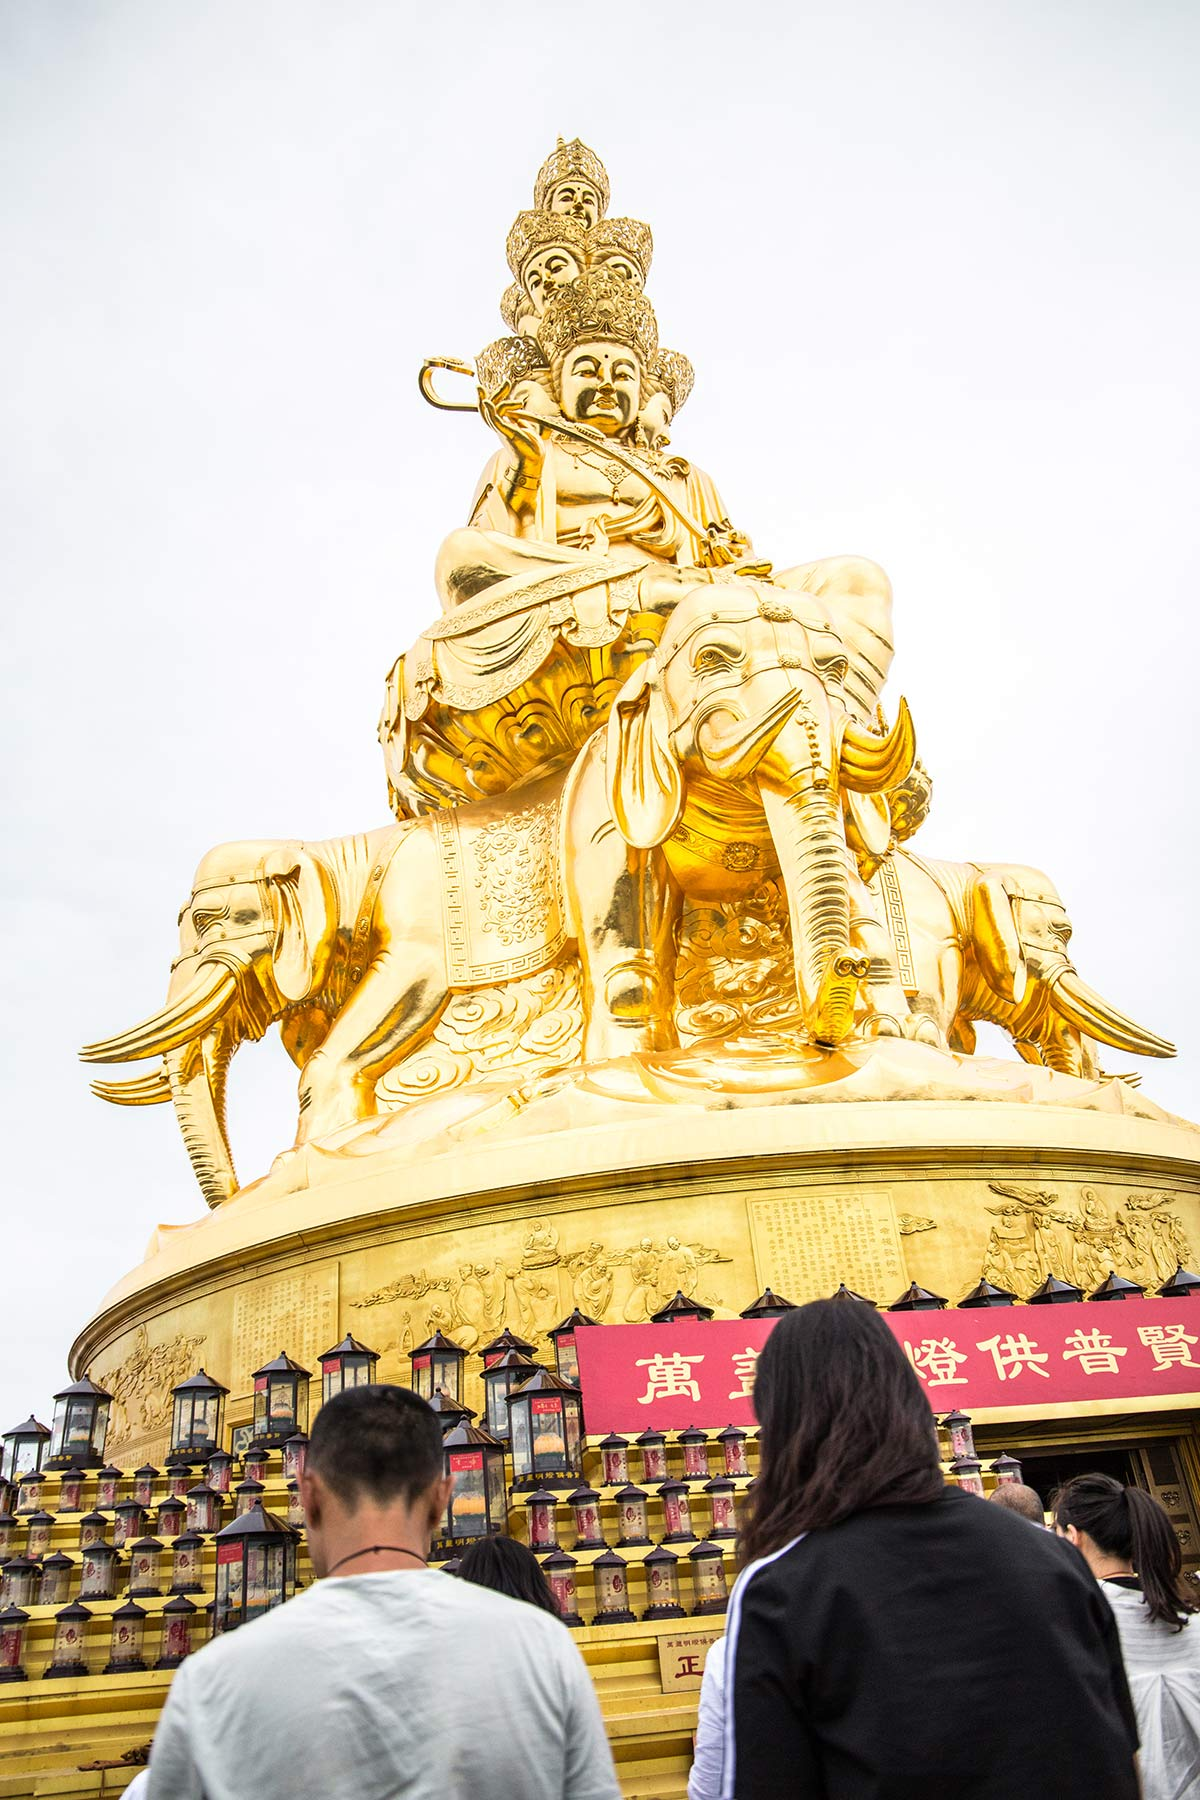 Goldene Statue auf dem Mount Emei in China